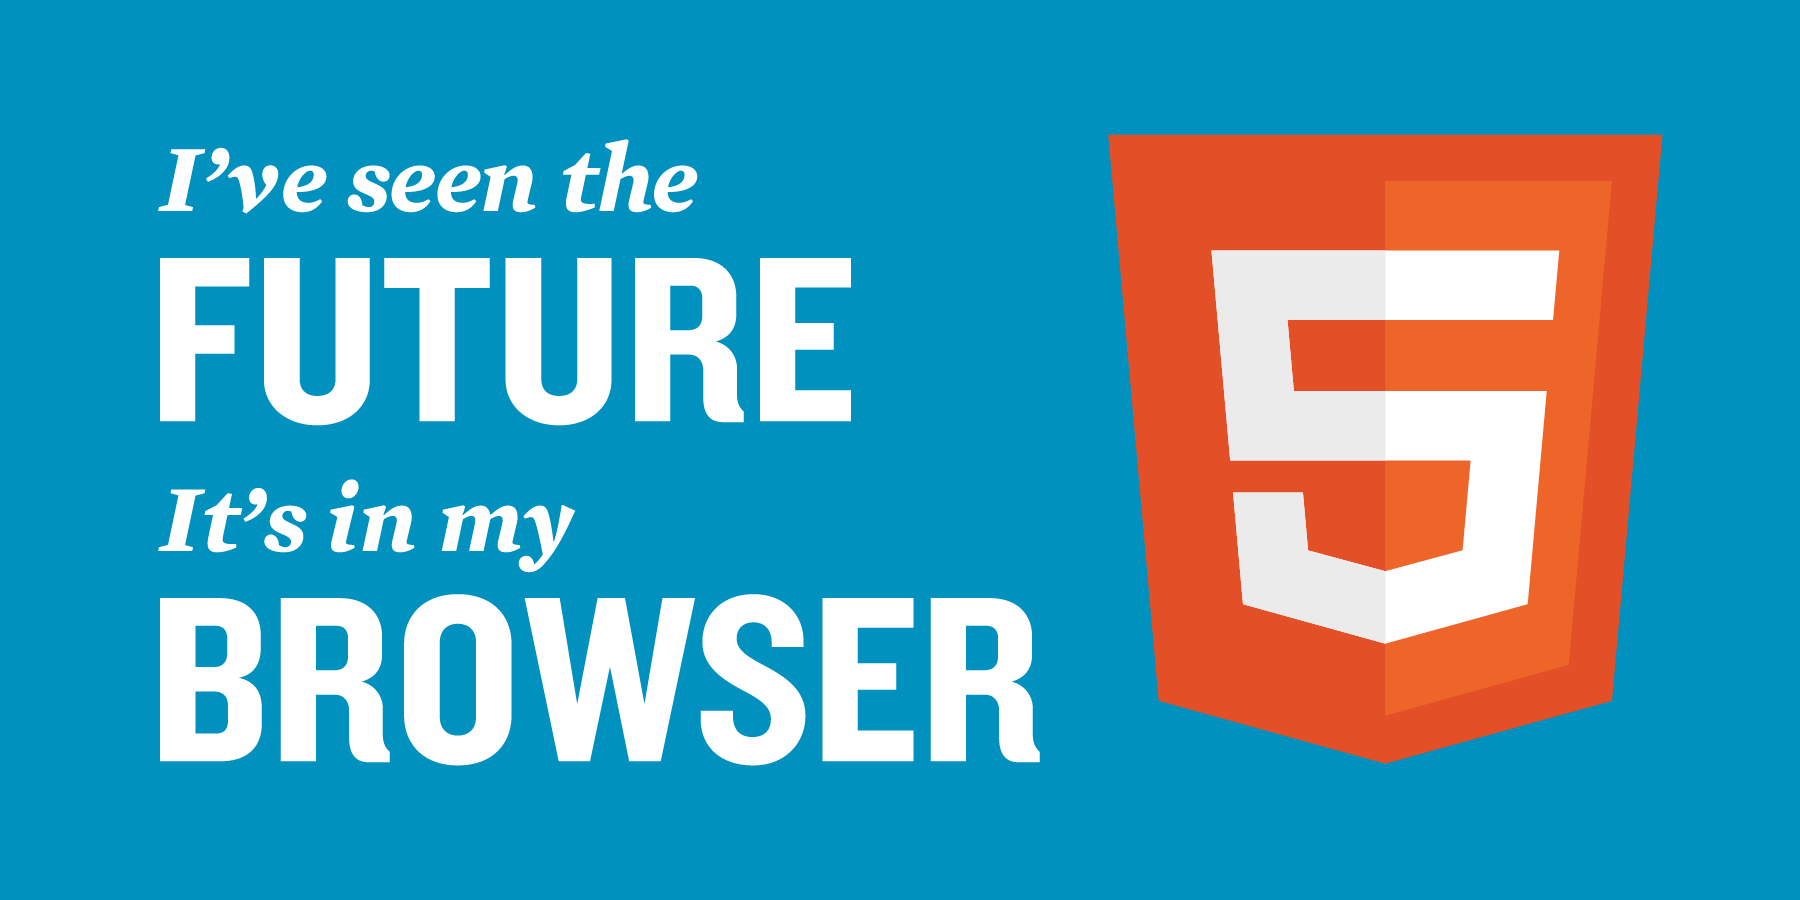 Goodbye Adobe Flash, Hello HTML5 - Free Goodbye PNG HD